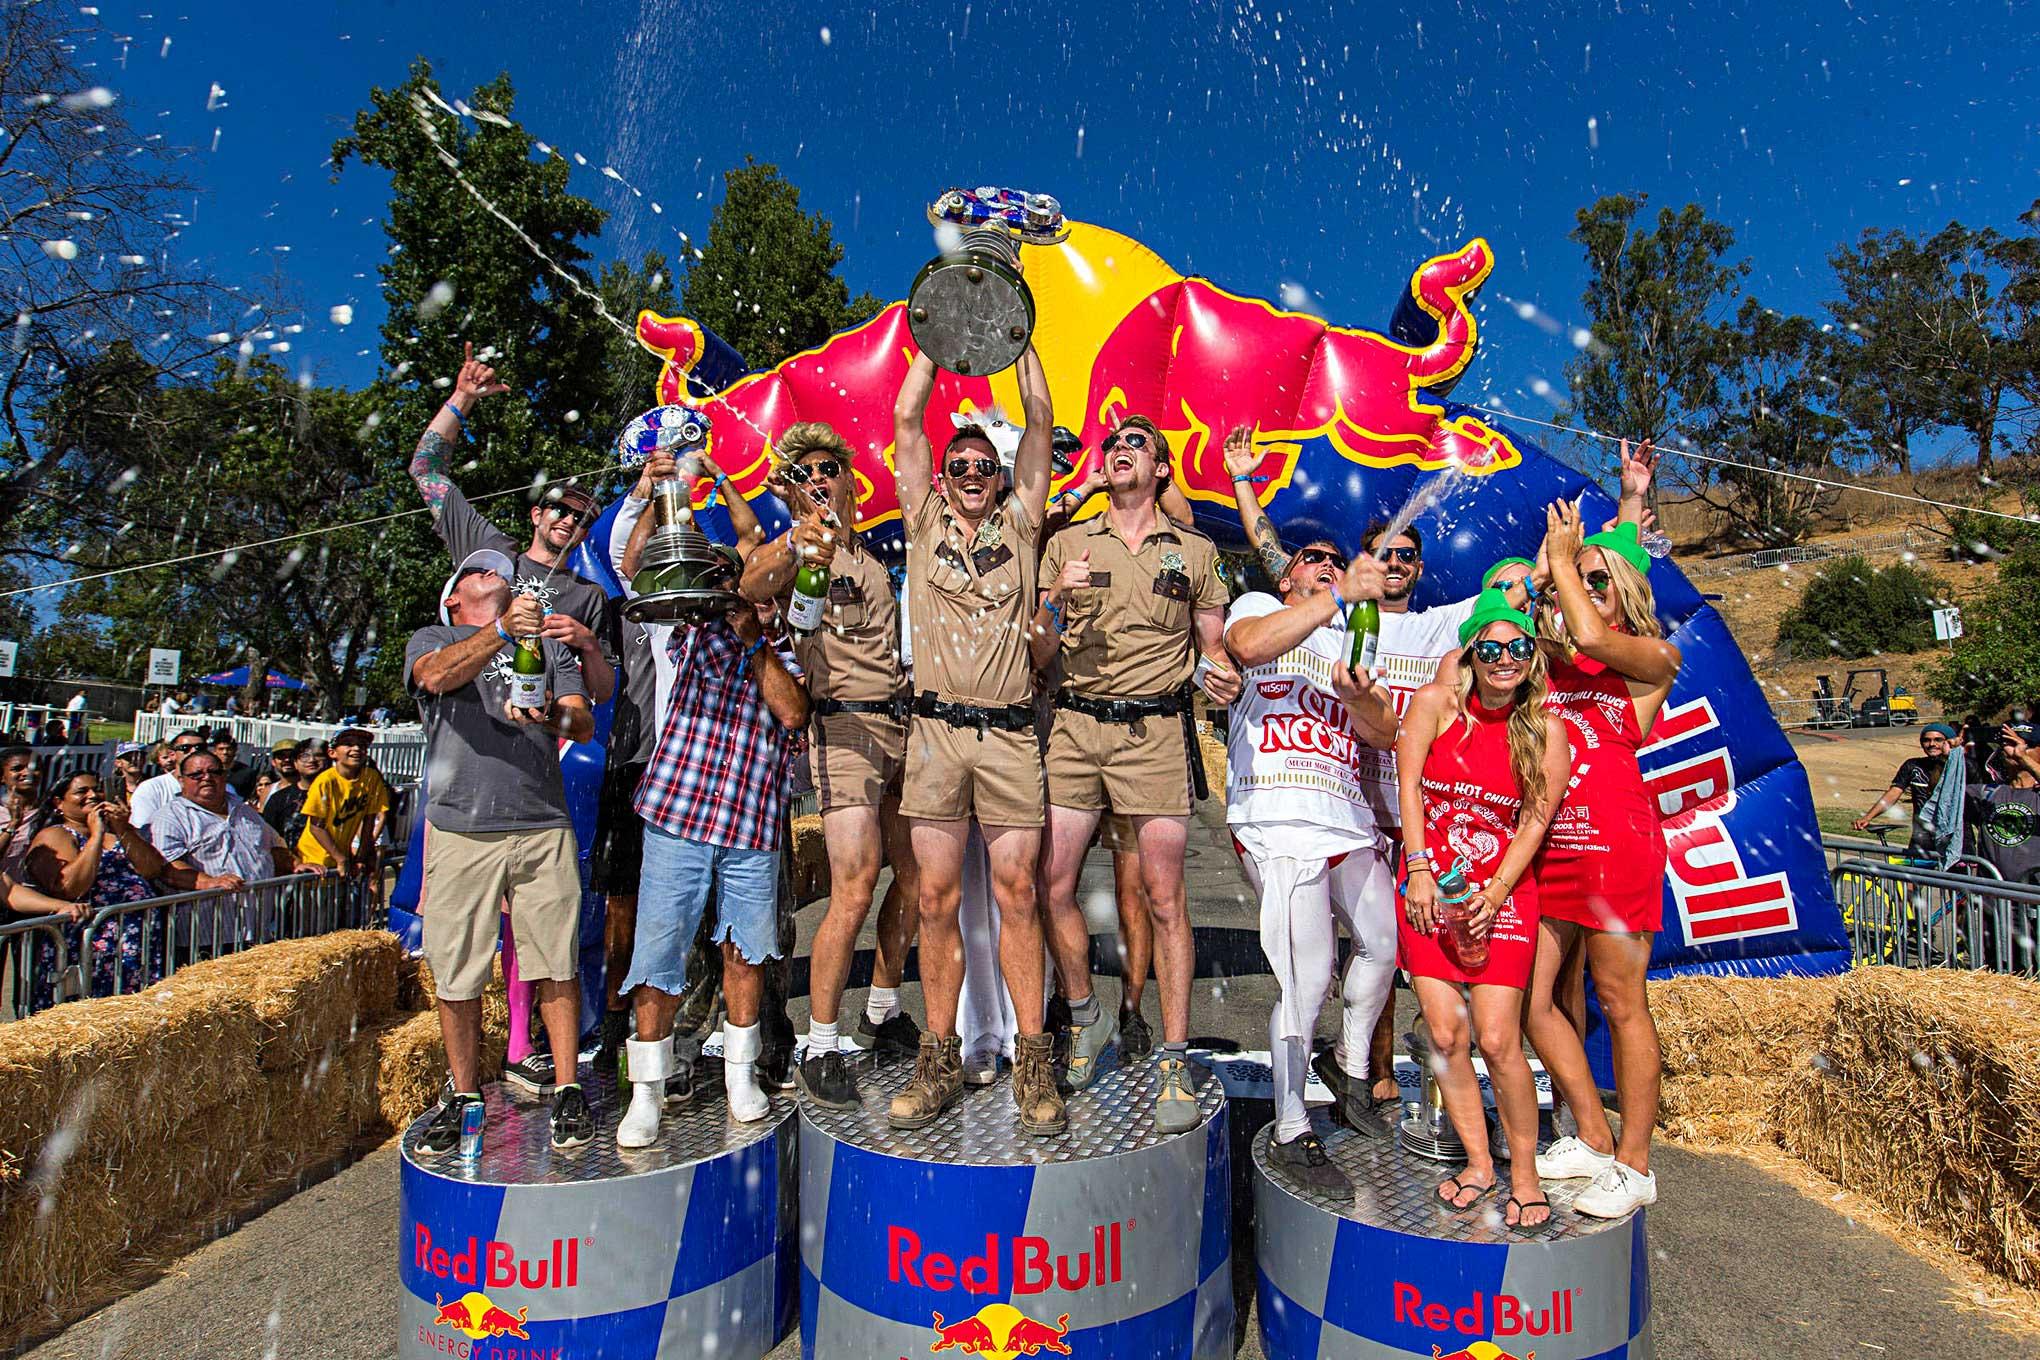 Red-Bull-Soapbox-Race-2017-Podium.jpg